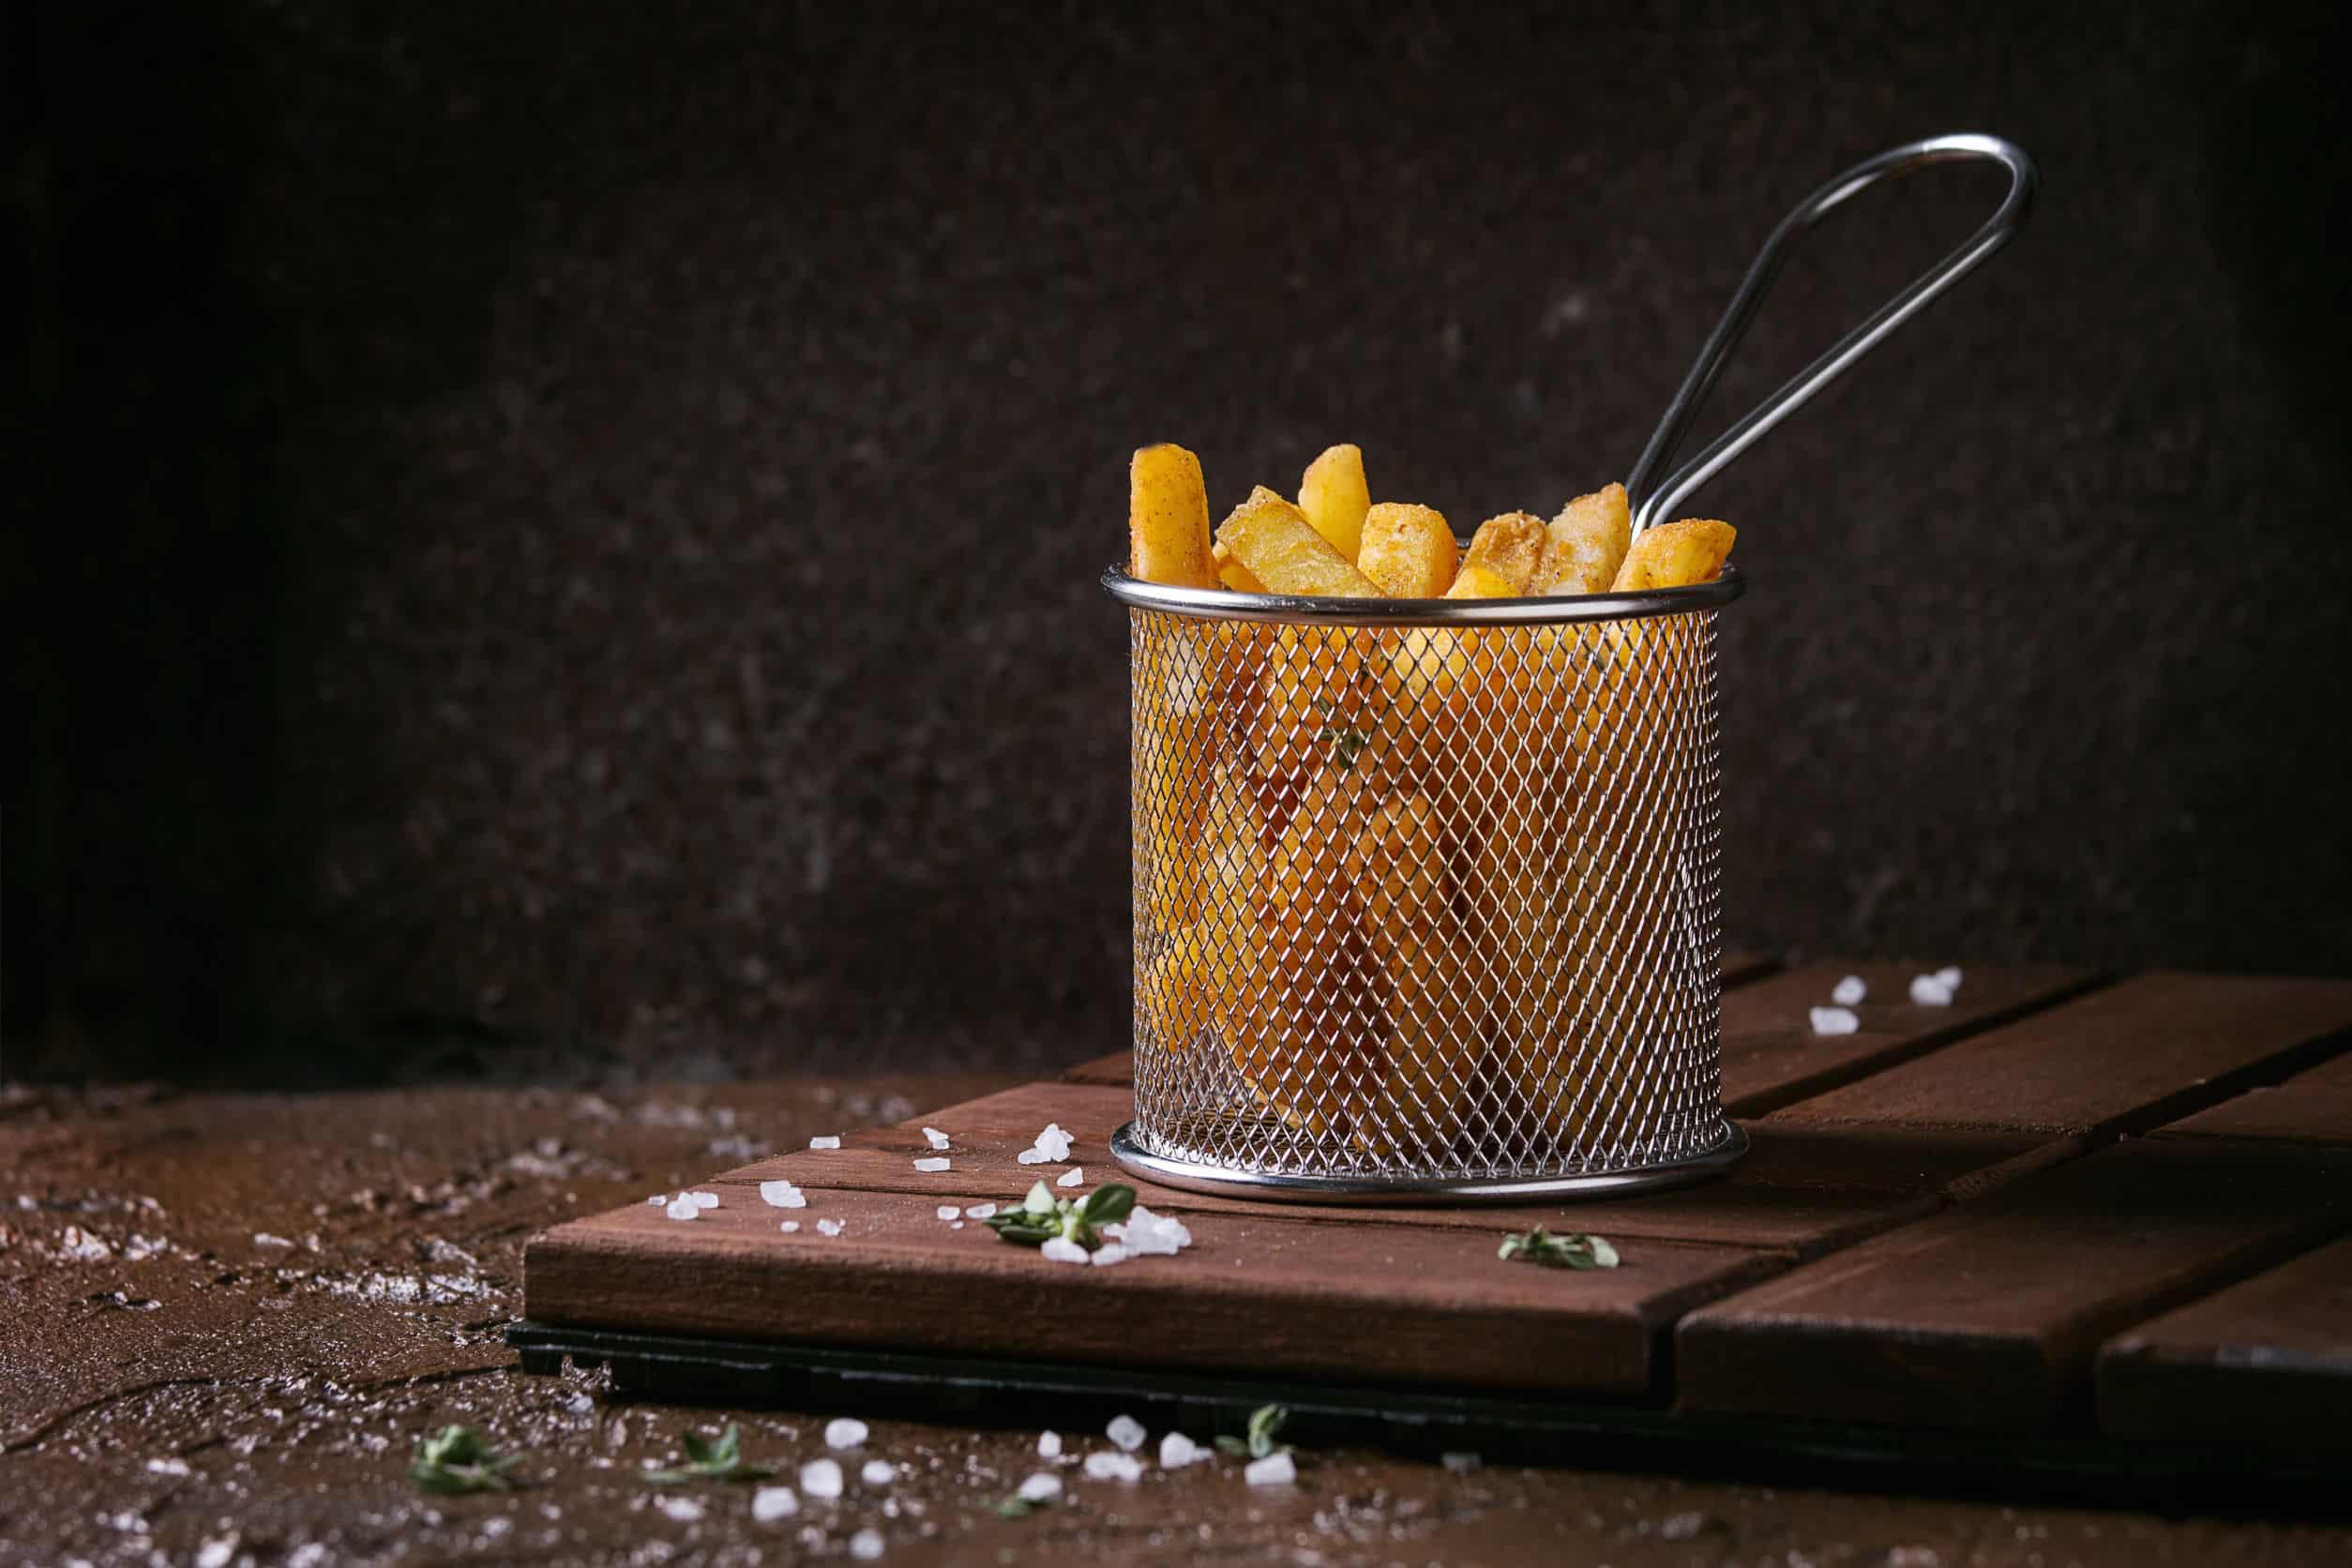 Gourmetmaxx Heißluft Fritteuse: Test & Empfehlungen (02/20)